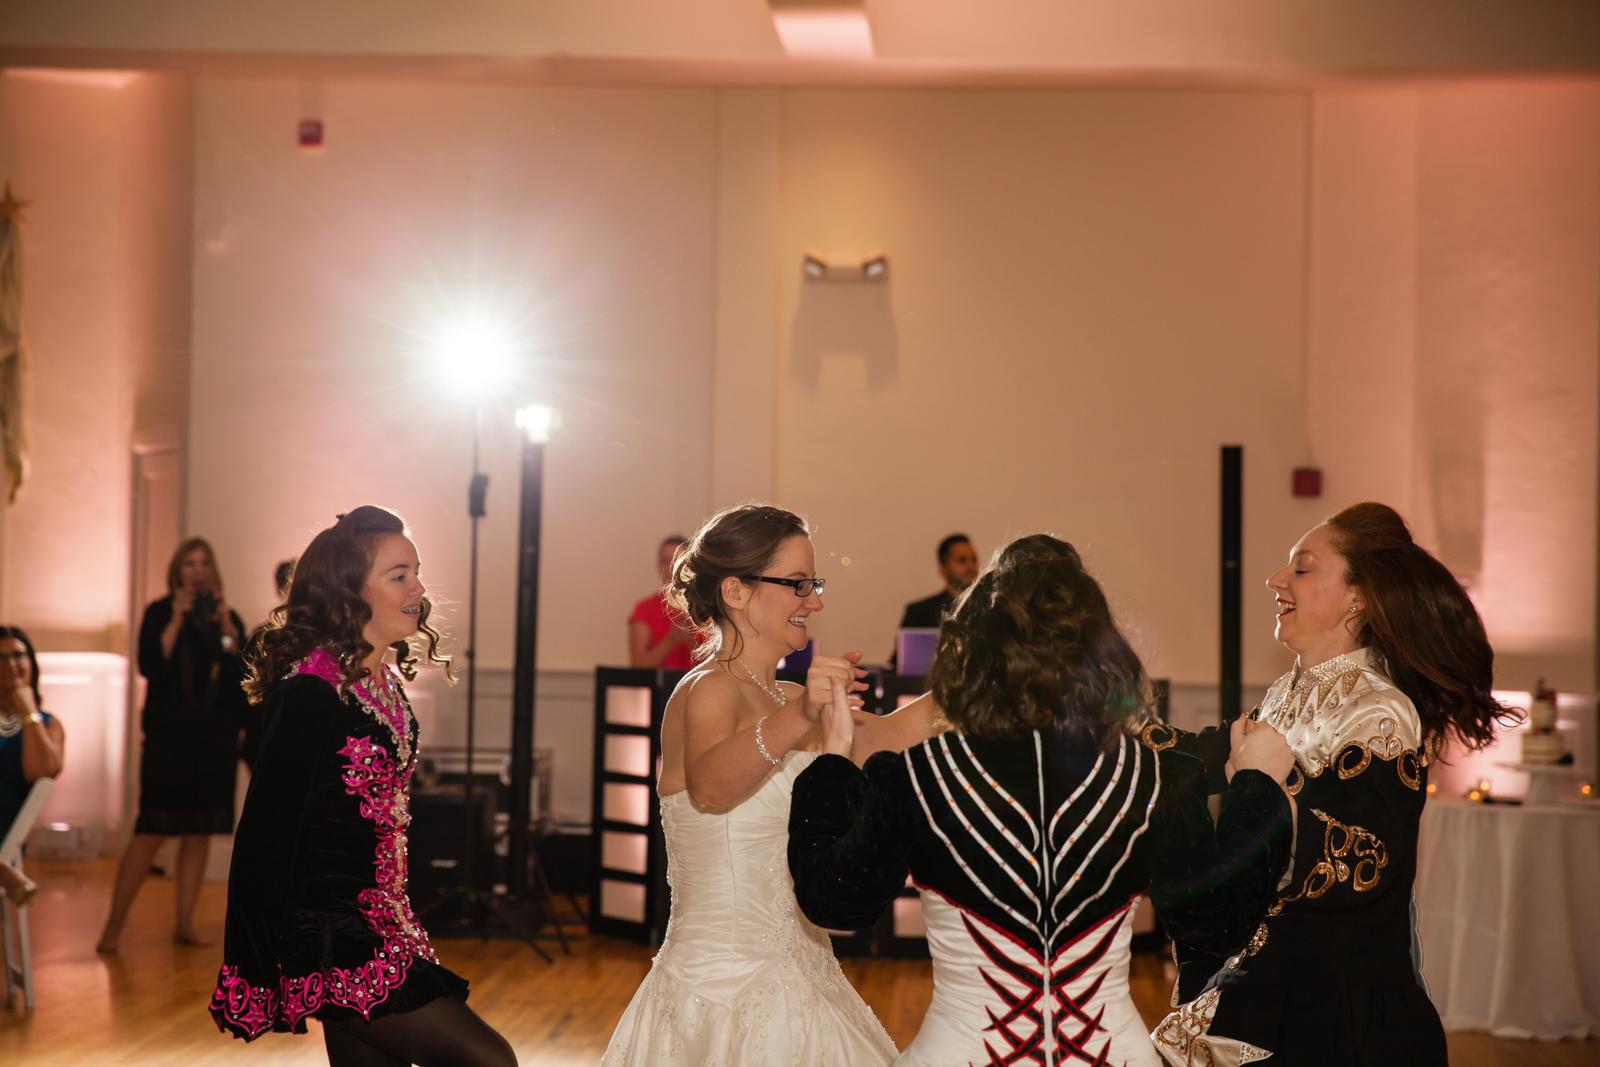 Eastons-Beach-Rotunda-Ballroom-Wedding-Newport-Rhode-Island-PhotographybyAmandaMorgan-113.jpg